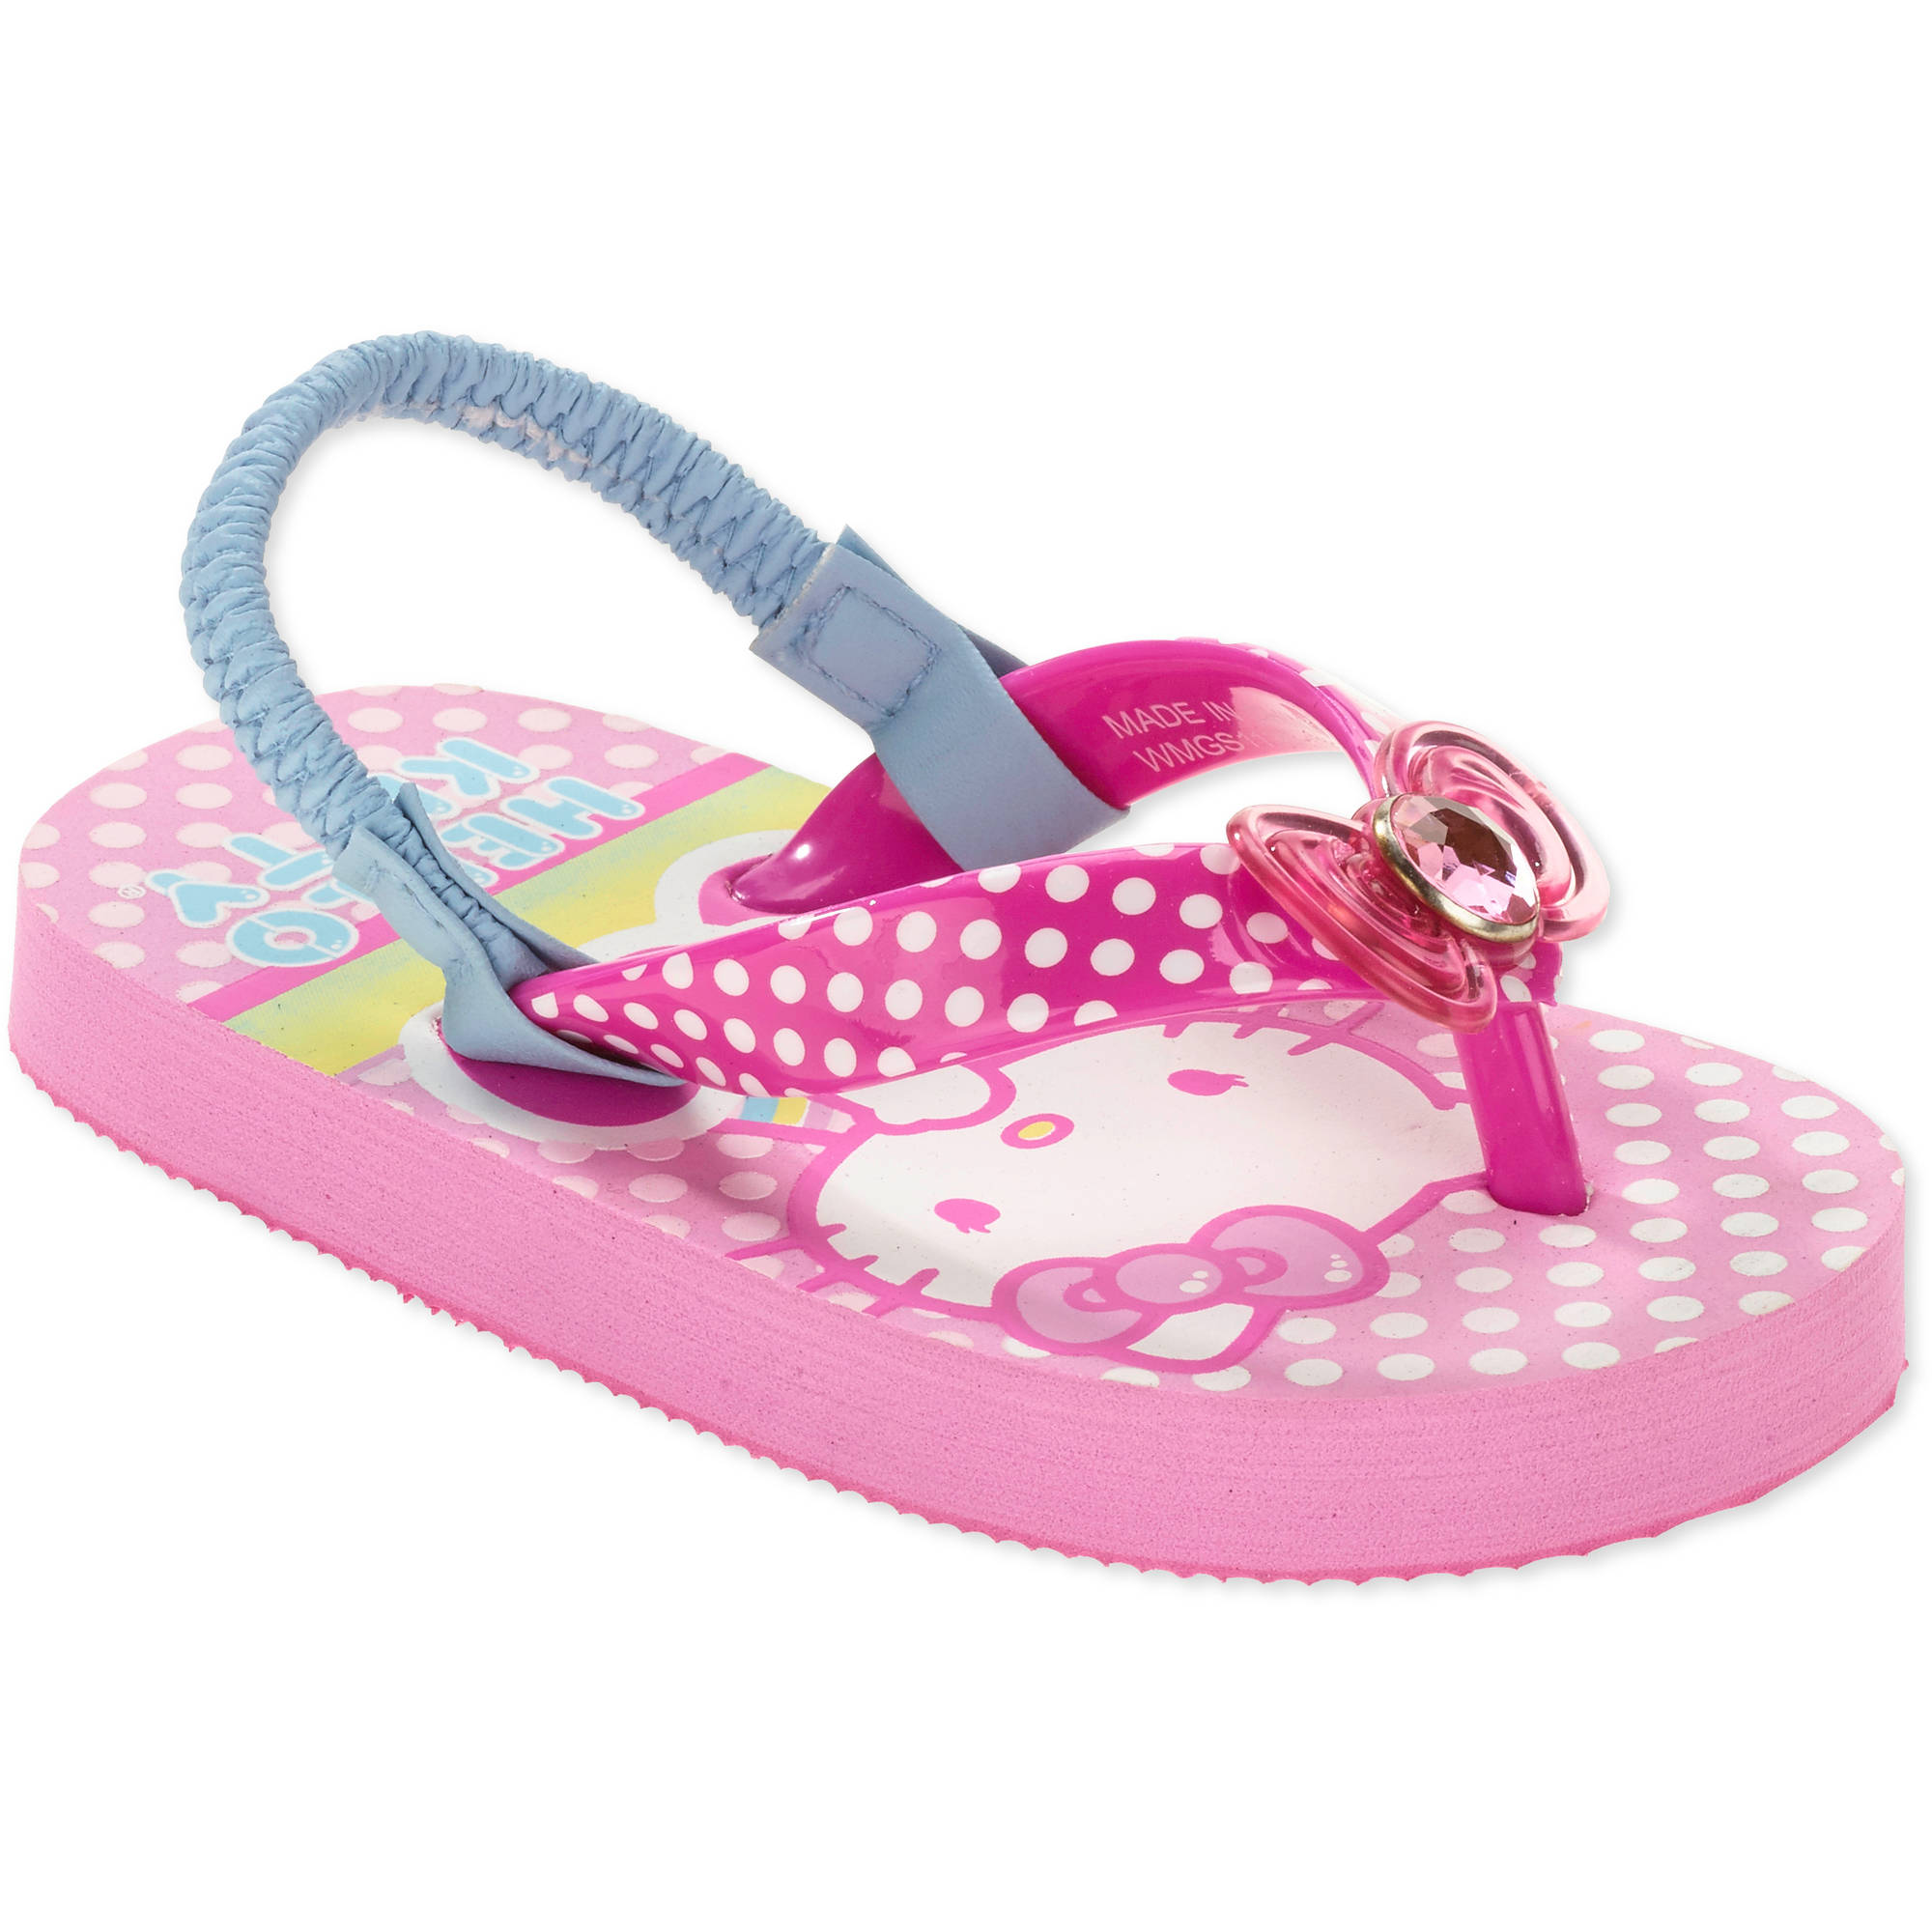 Find great deals on eBay for toddler girls flip flops. Shop with confidence.